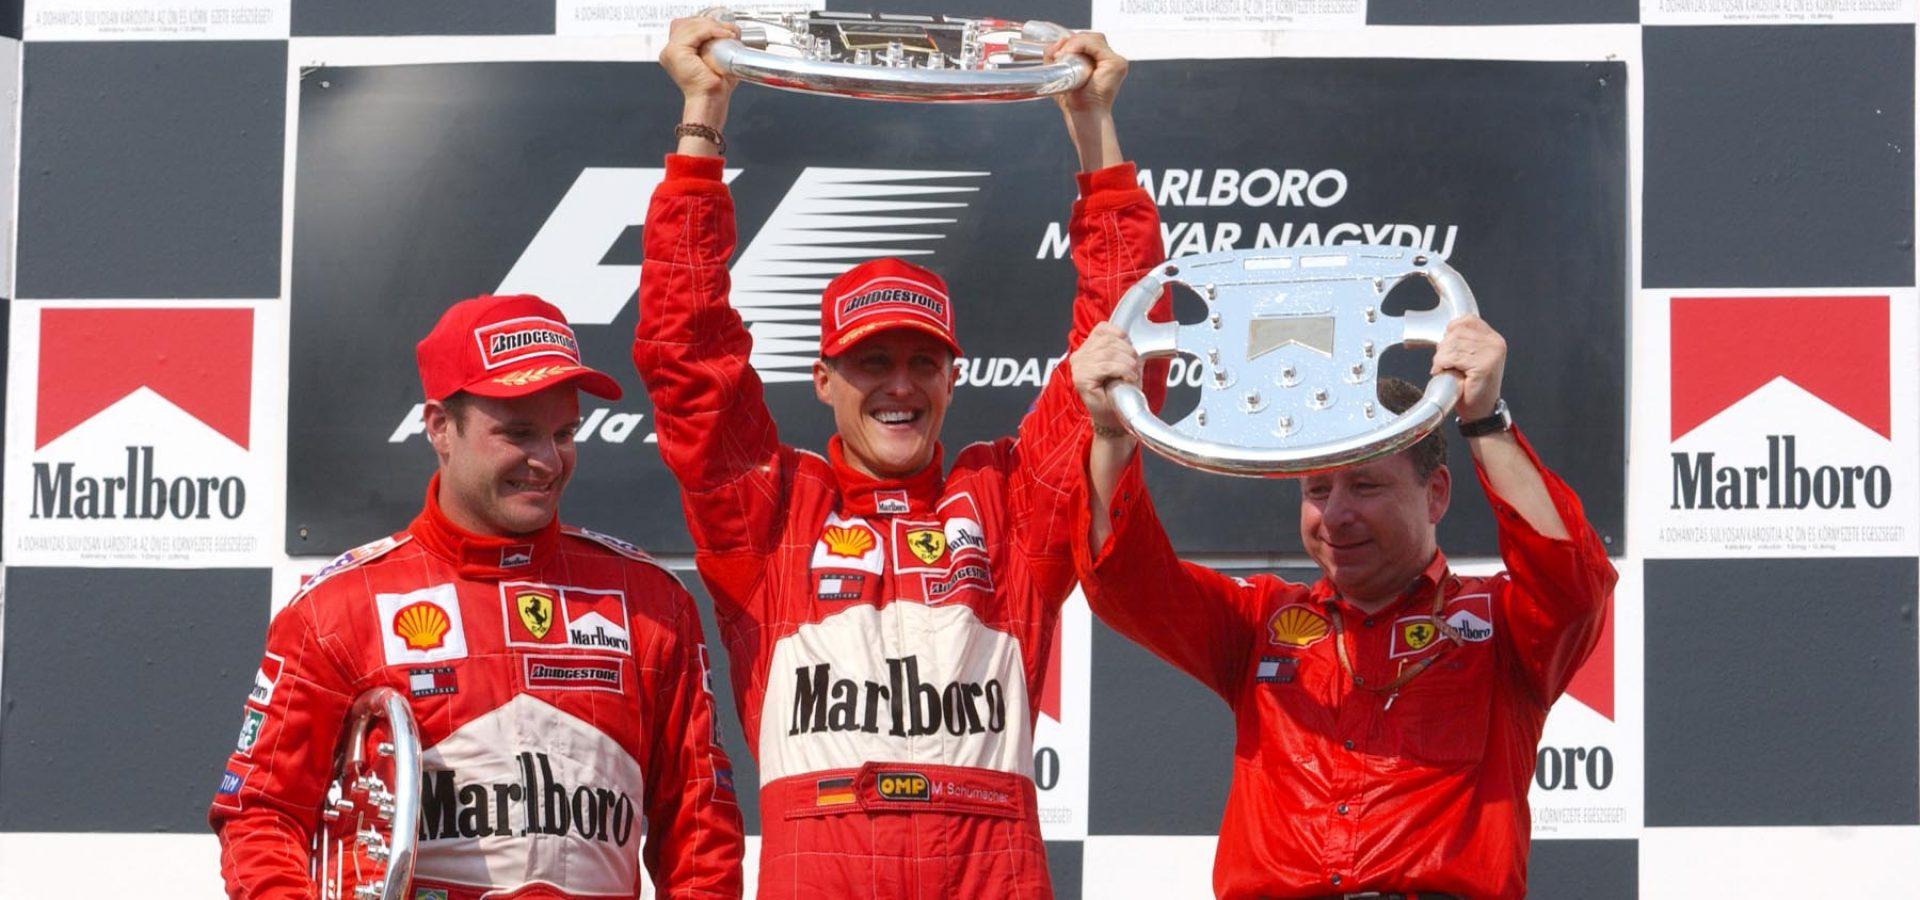 Rubens Barrichello, Michael Schumacher, Ferrari, 2001, Jean Todt, world champions, title, Hungarian GP, Mogyoród, Hungaroring